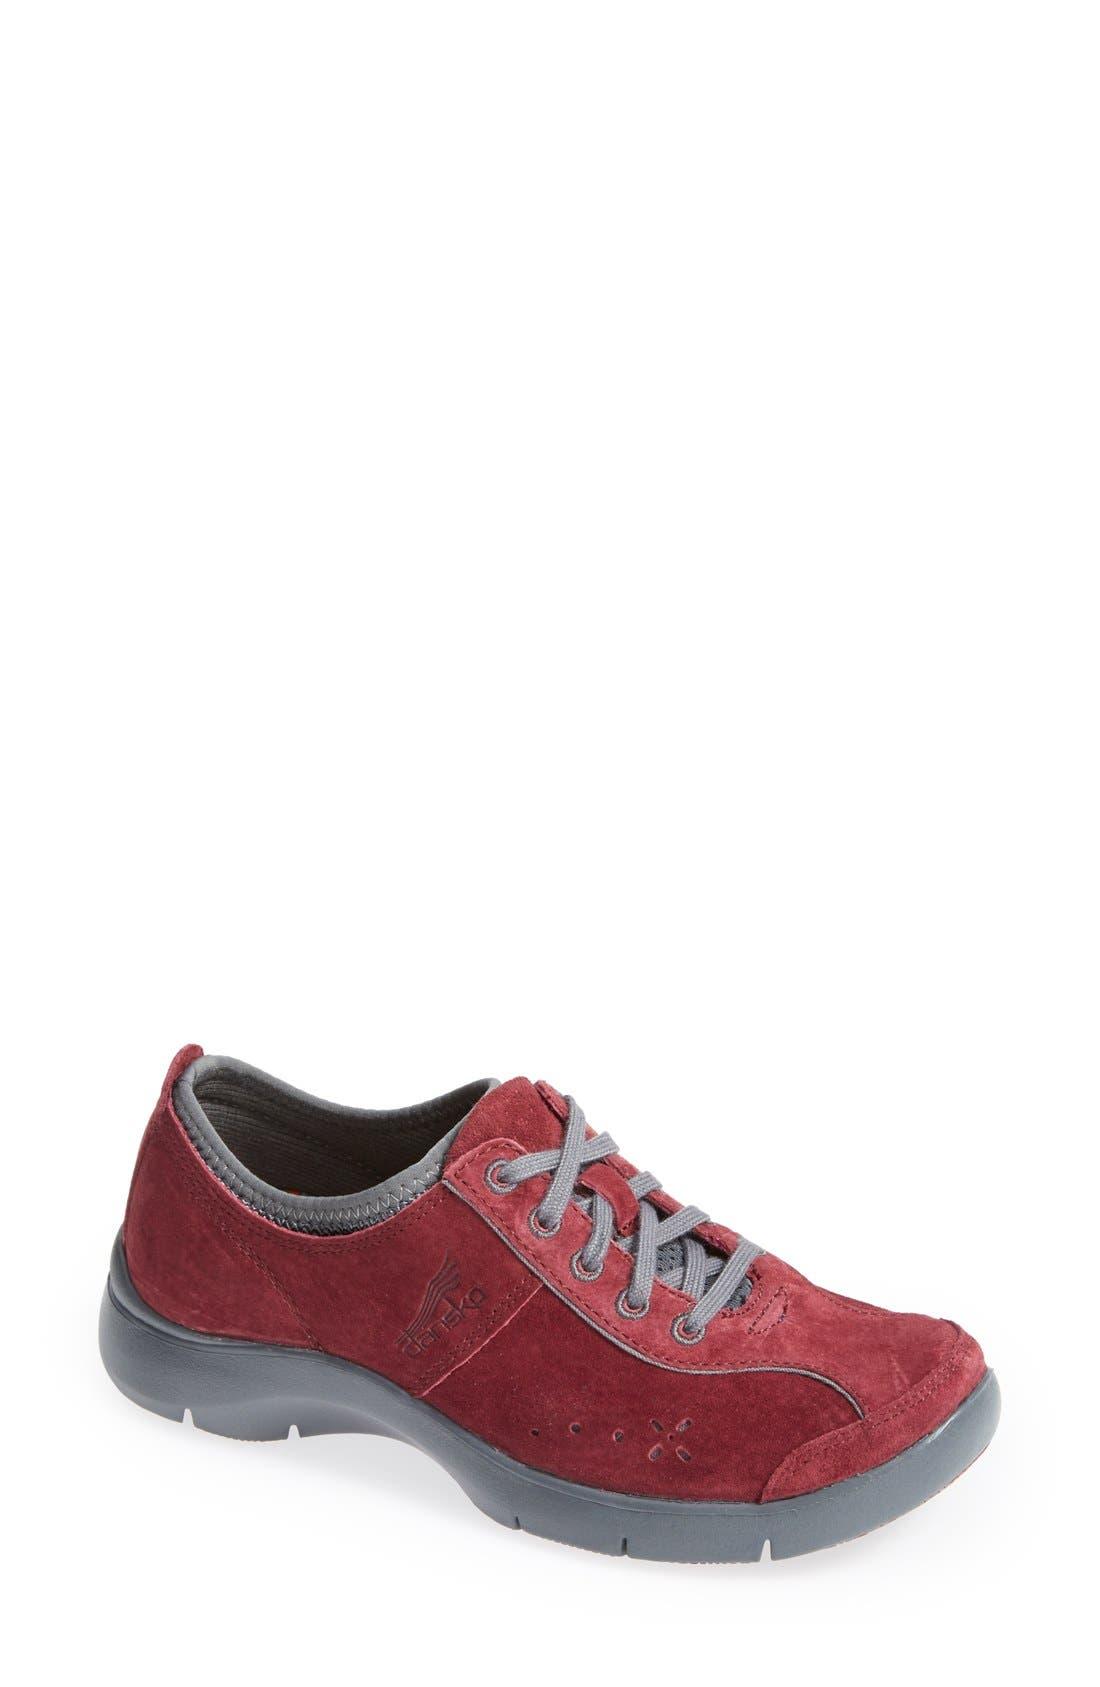 Main Image - Dansko 'Elise' Sneaker